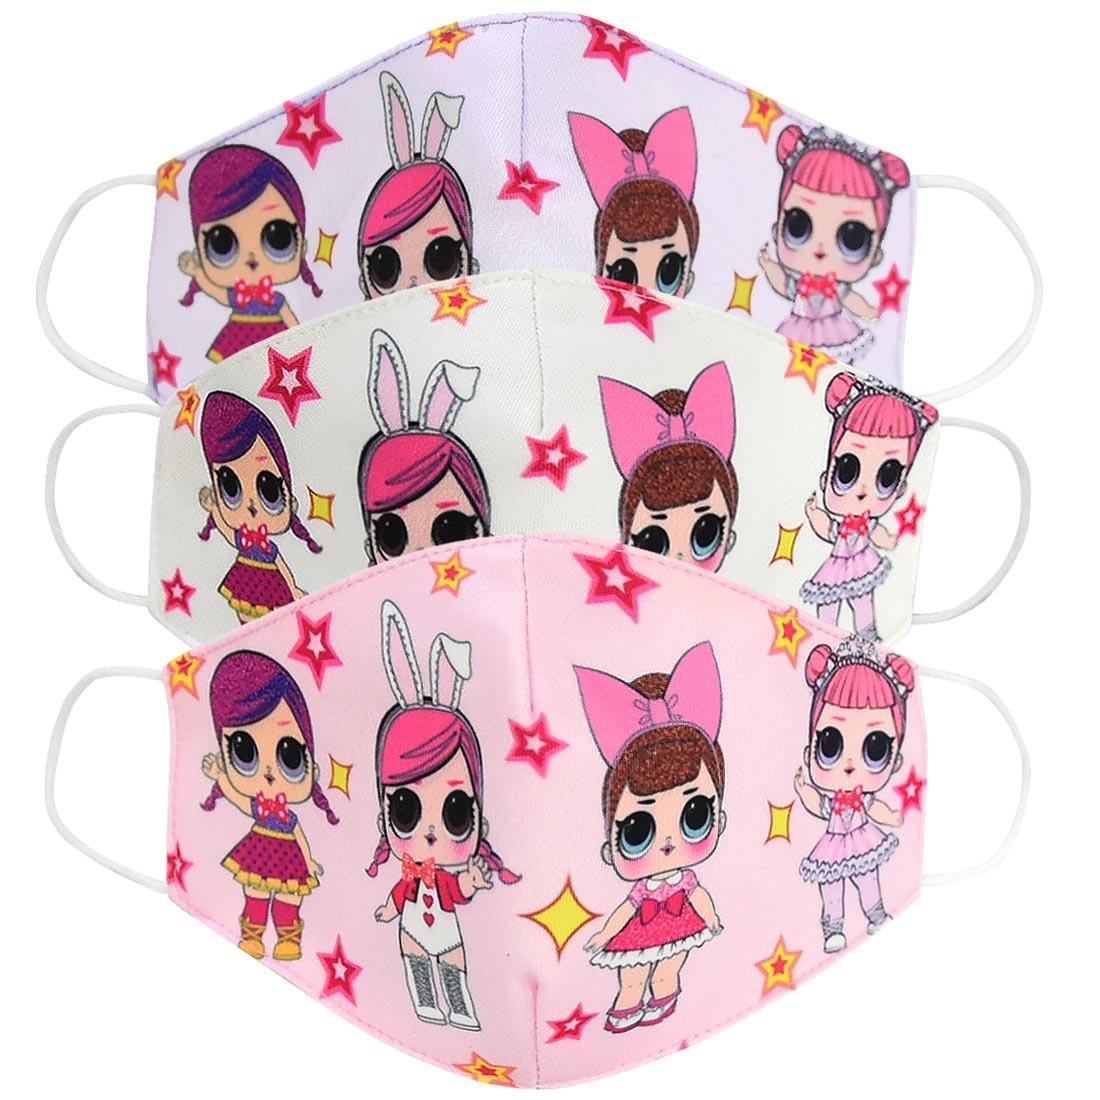 LOL Surprise Doll Toys Half Muffle Face Mask Kids Lol Dolls Cotton Dustproof Cartoon Mouth Masks Breathable Mask